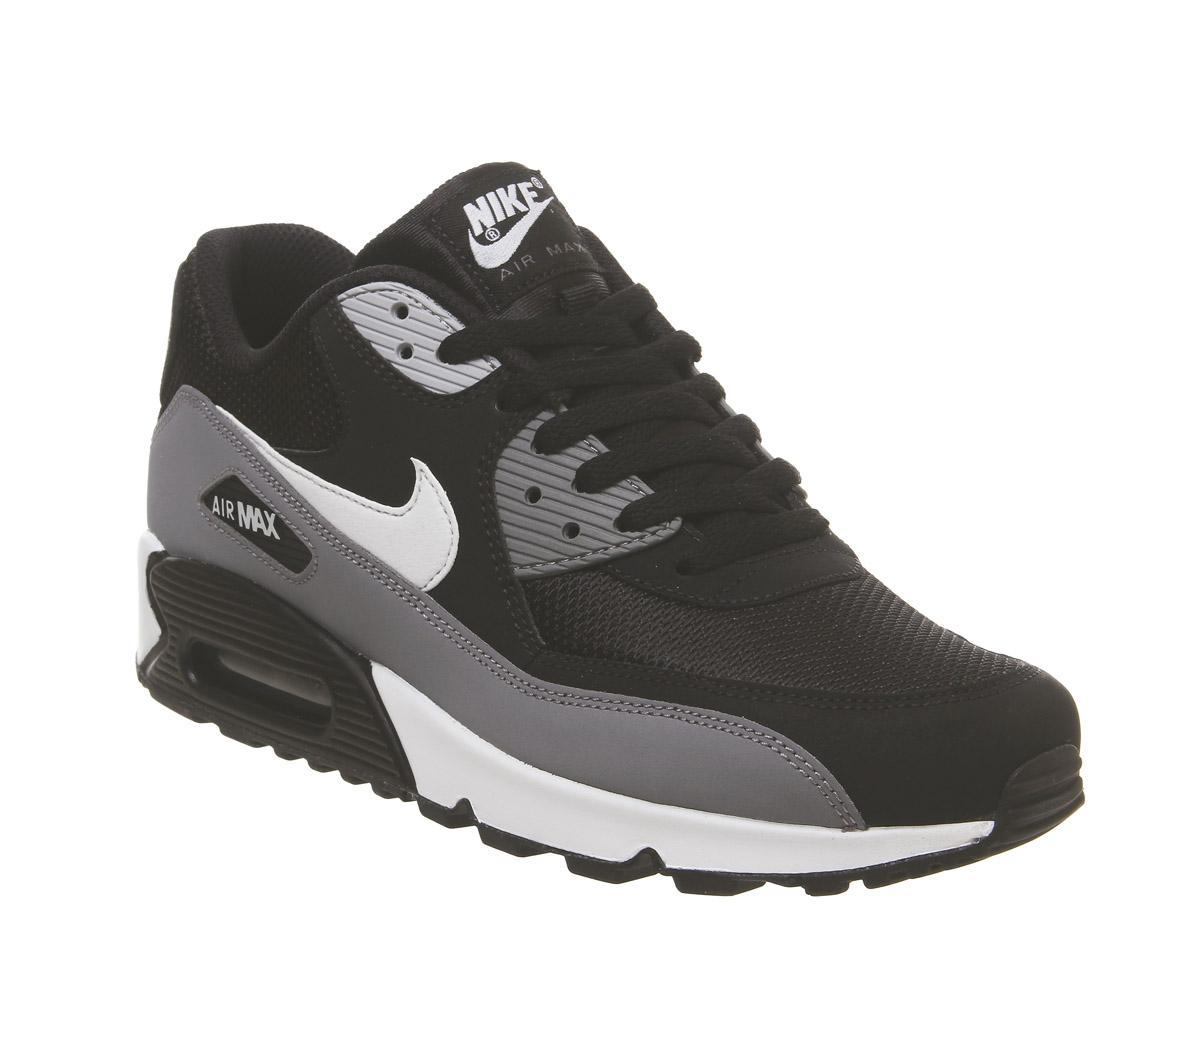 Nike Air Max 90 Trainers Black White